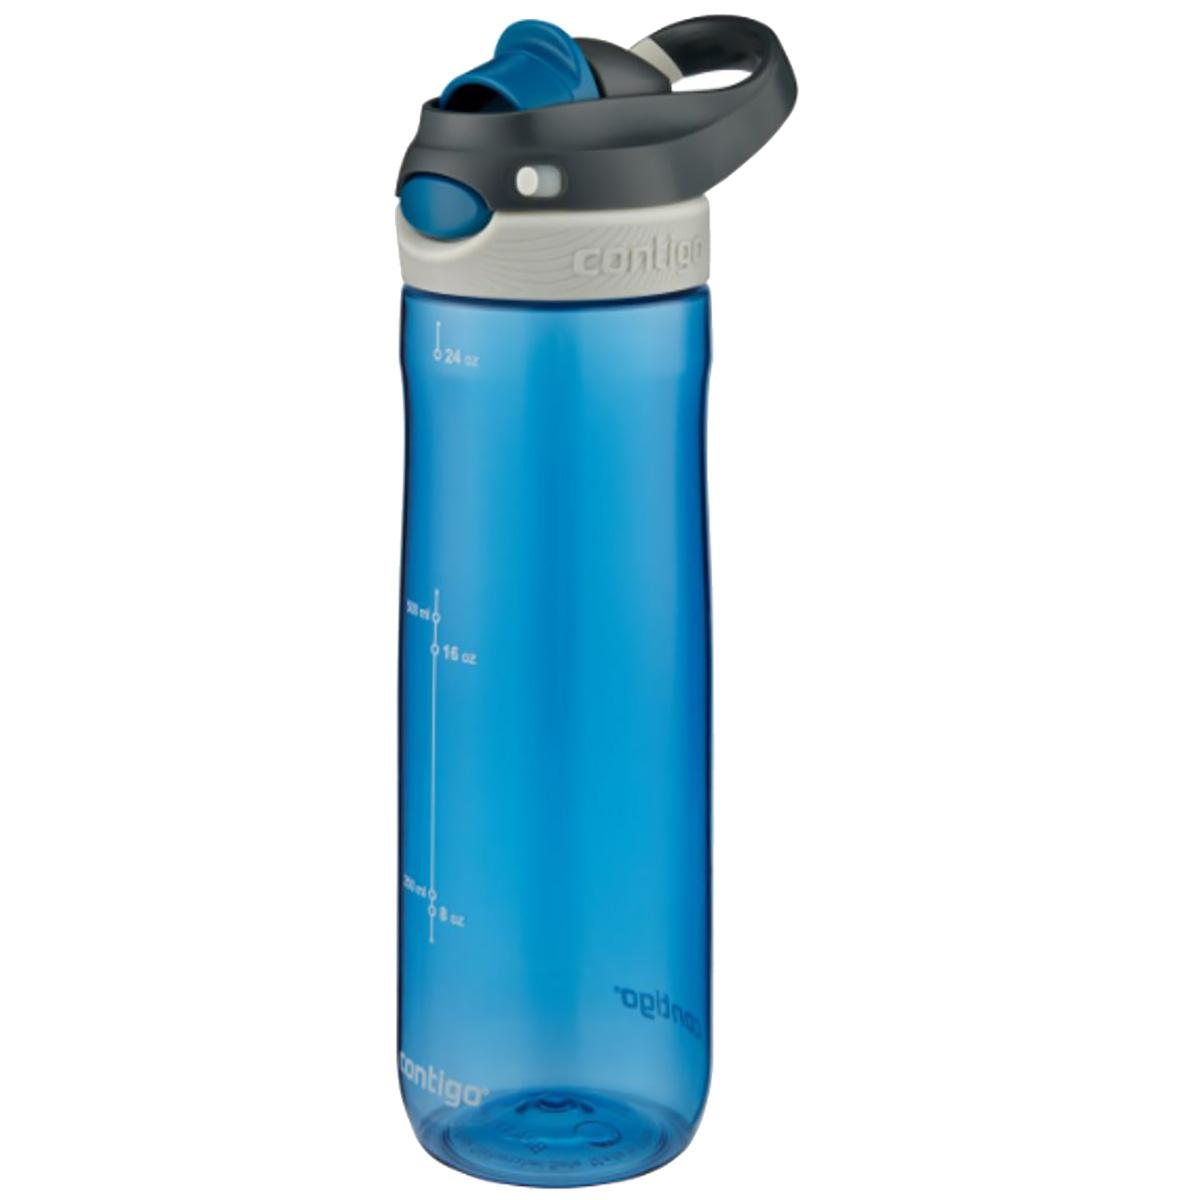 Contigo-24-oz-Chug-Autospout-Leak-Proof-Water-Bottle miniatuur 10